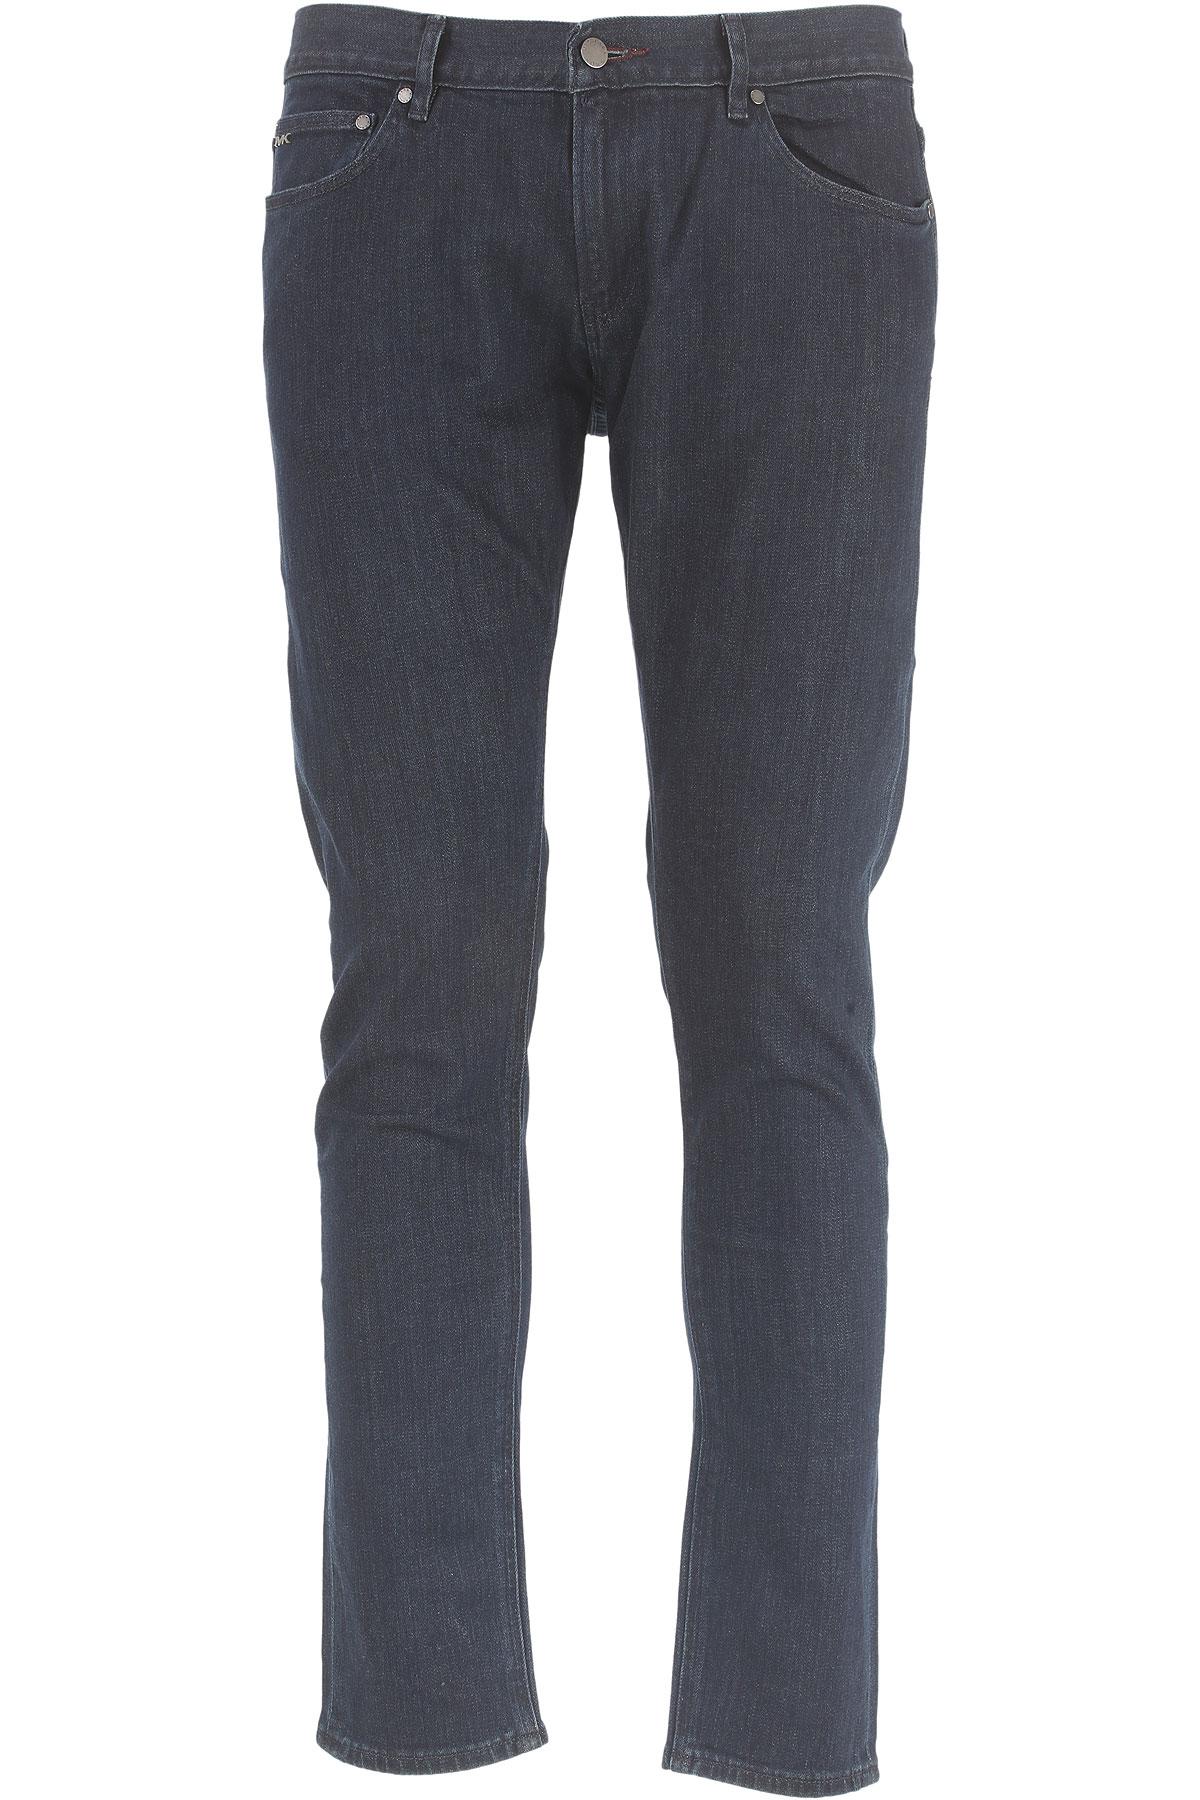 Michael Kors Vaqueros de Hombre, Pantalones Vaqueros Baratos en Rebajas Outlet, Azul Oscuro, Algodon, 2019, 47 48 50